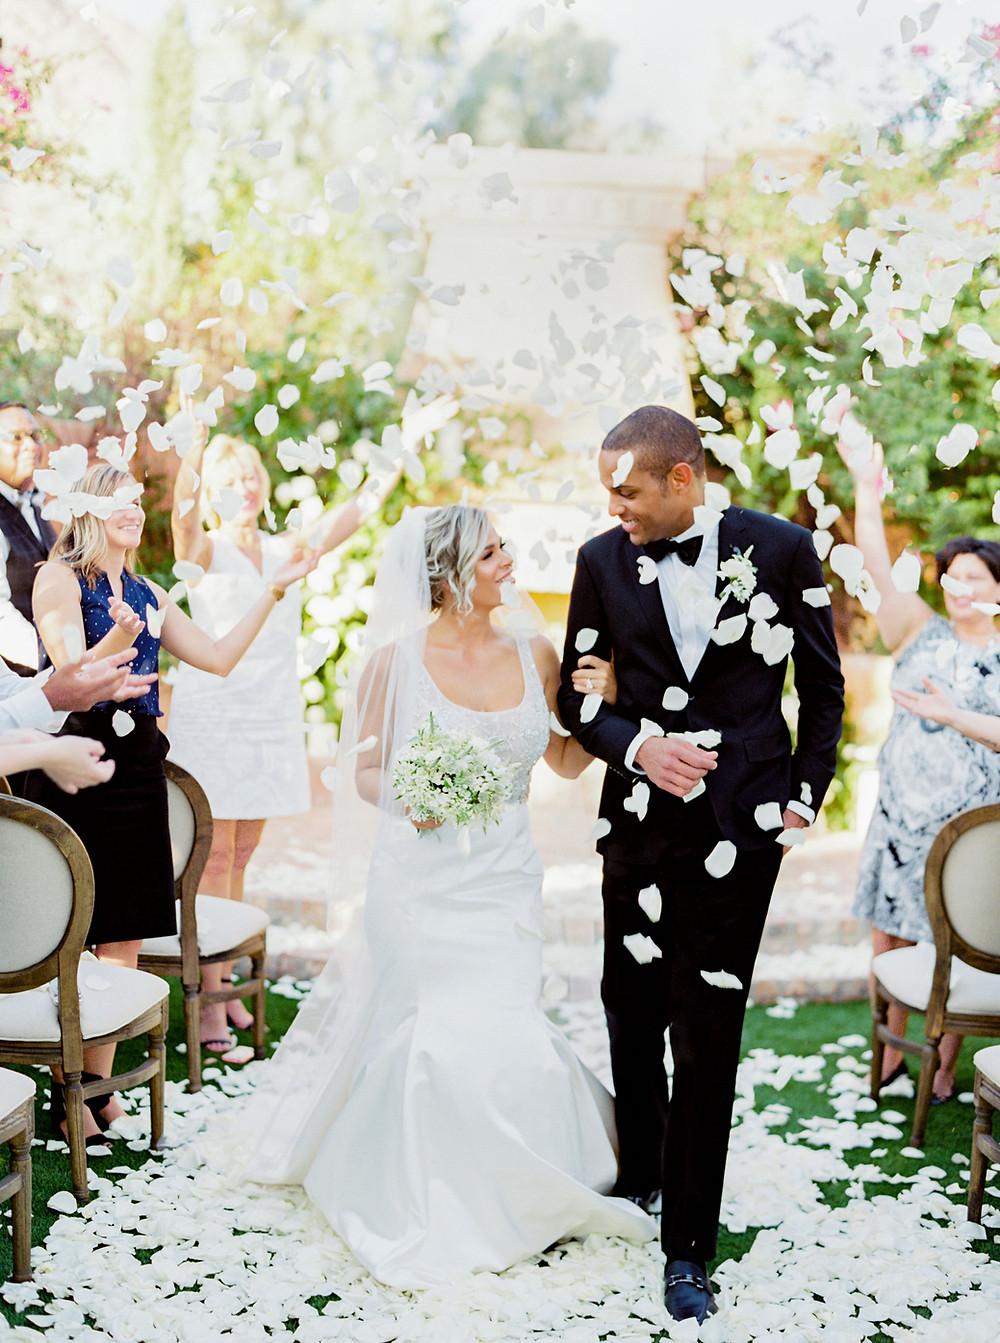 Royal Palms Wedding, Ceremony, Bride and Groom